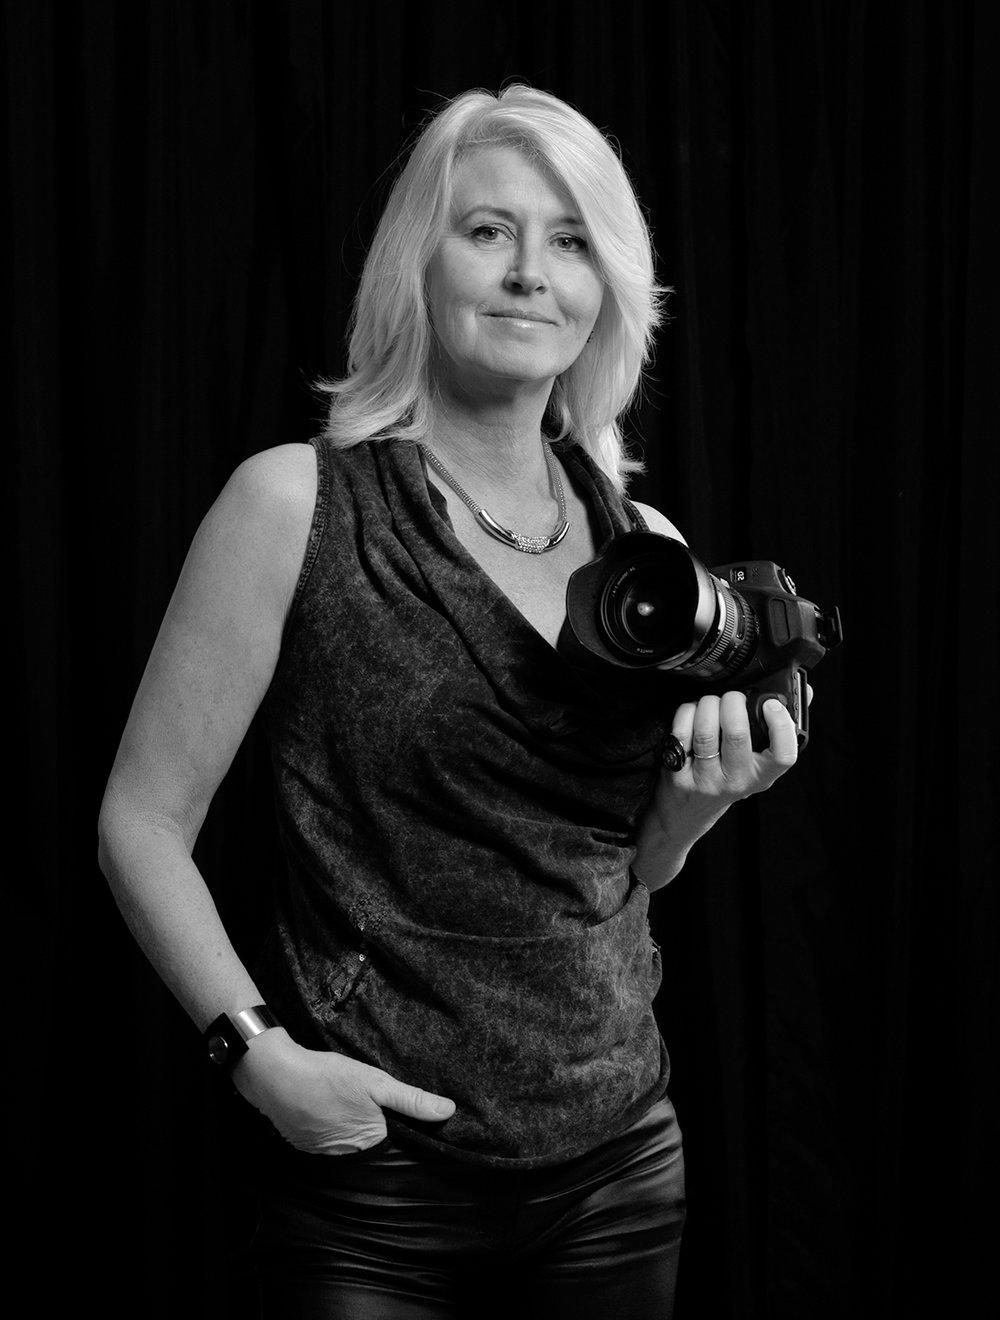 fotografe-Jeannette-Smartfocus.jpg